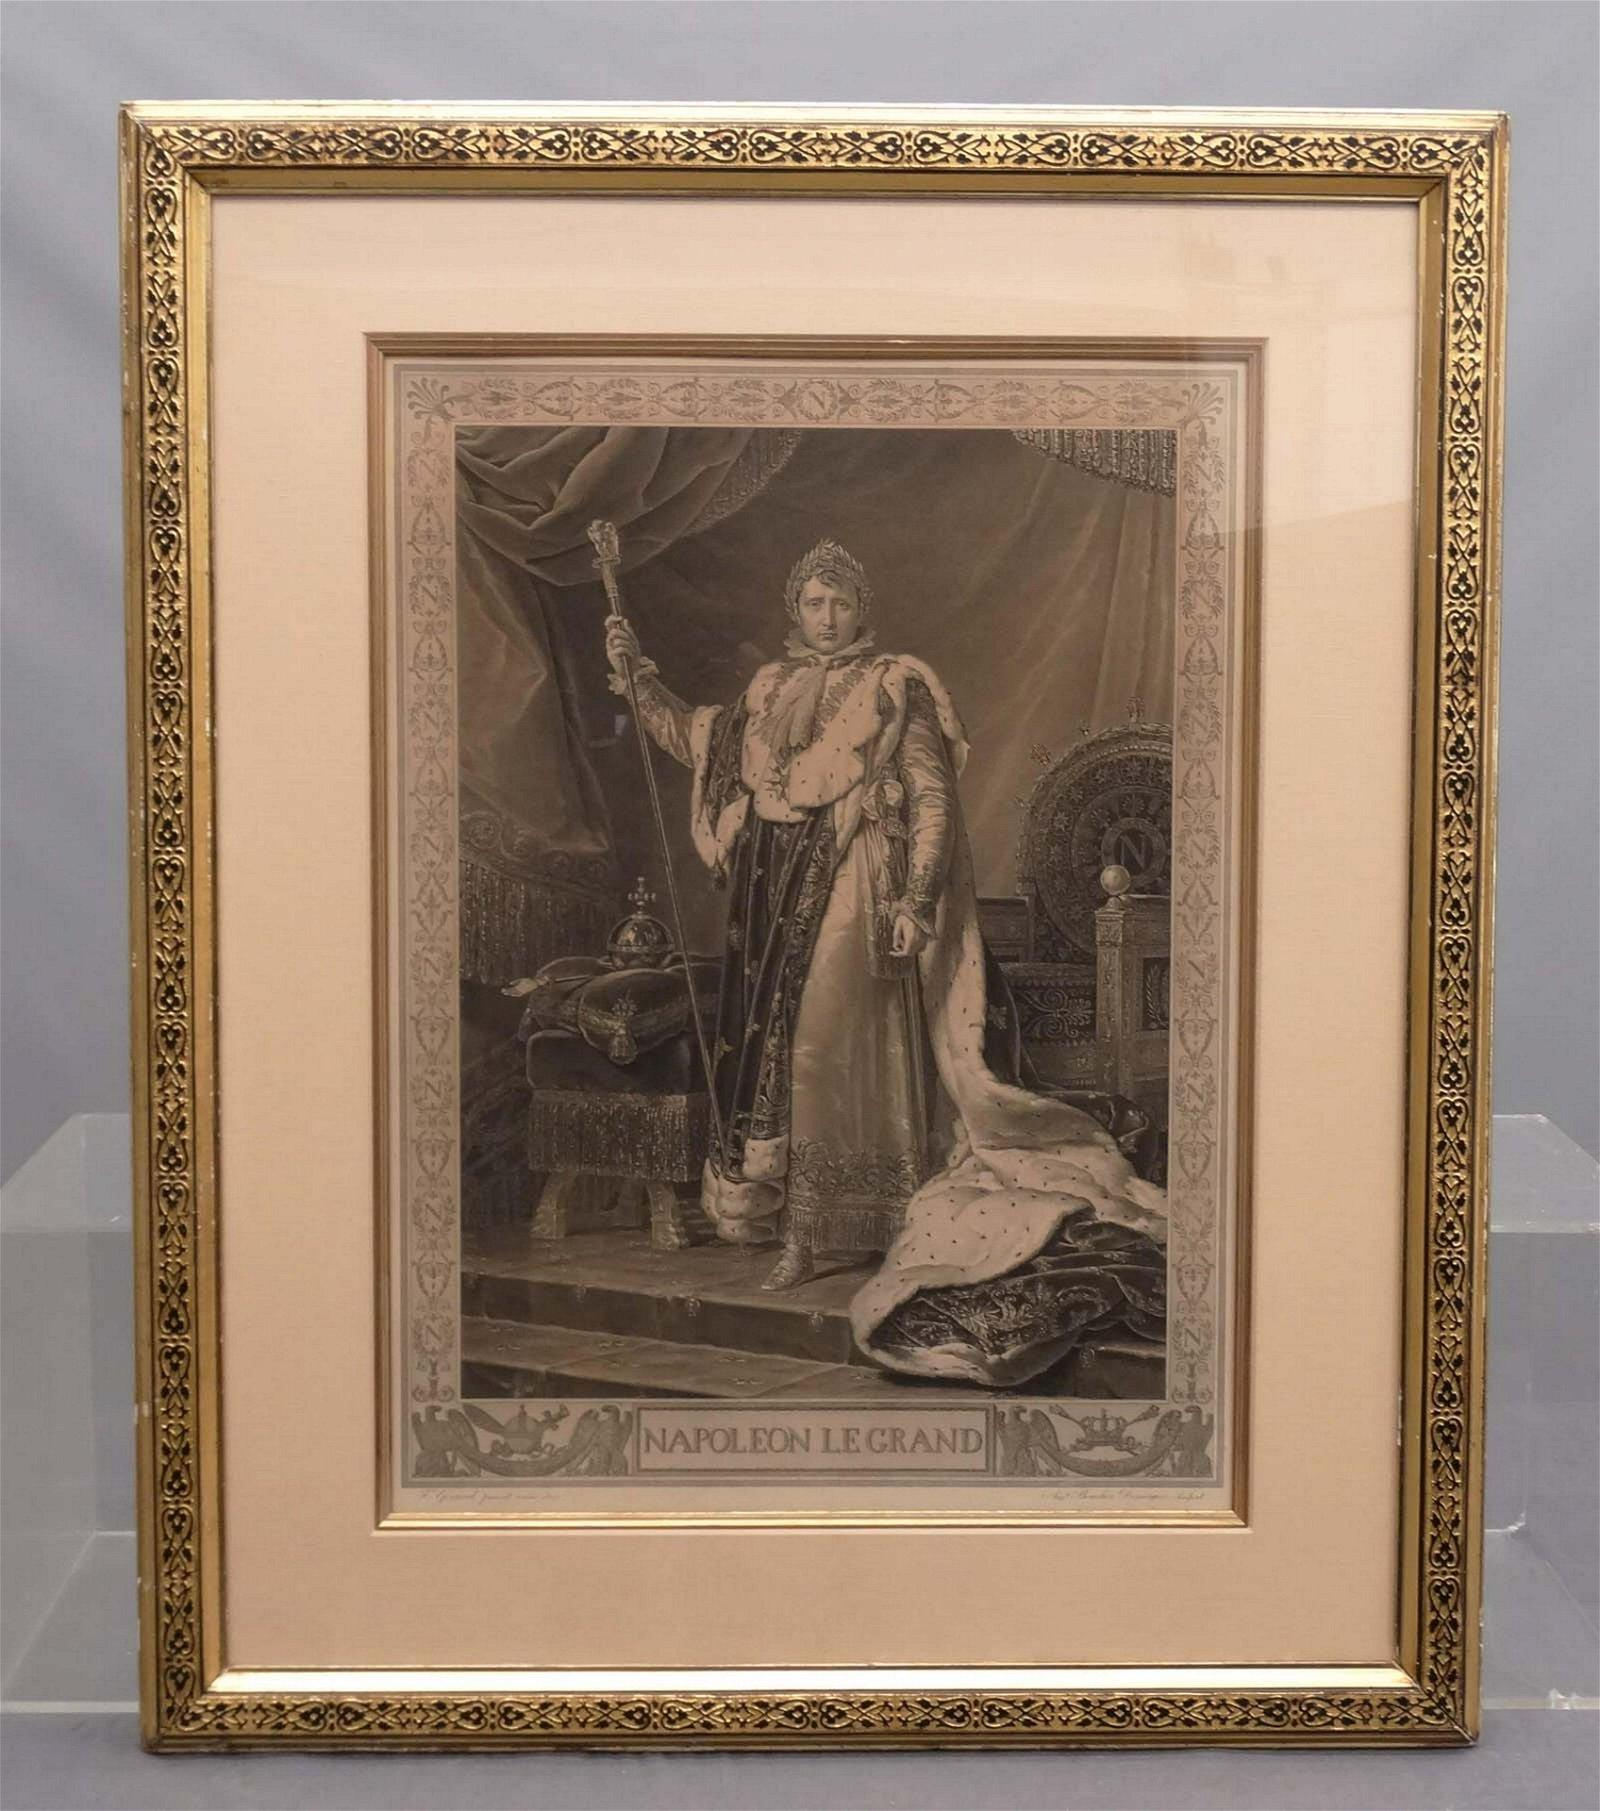 Napoleon Portrait Early Engraving